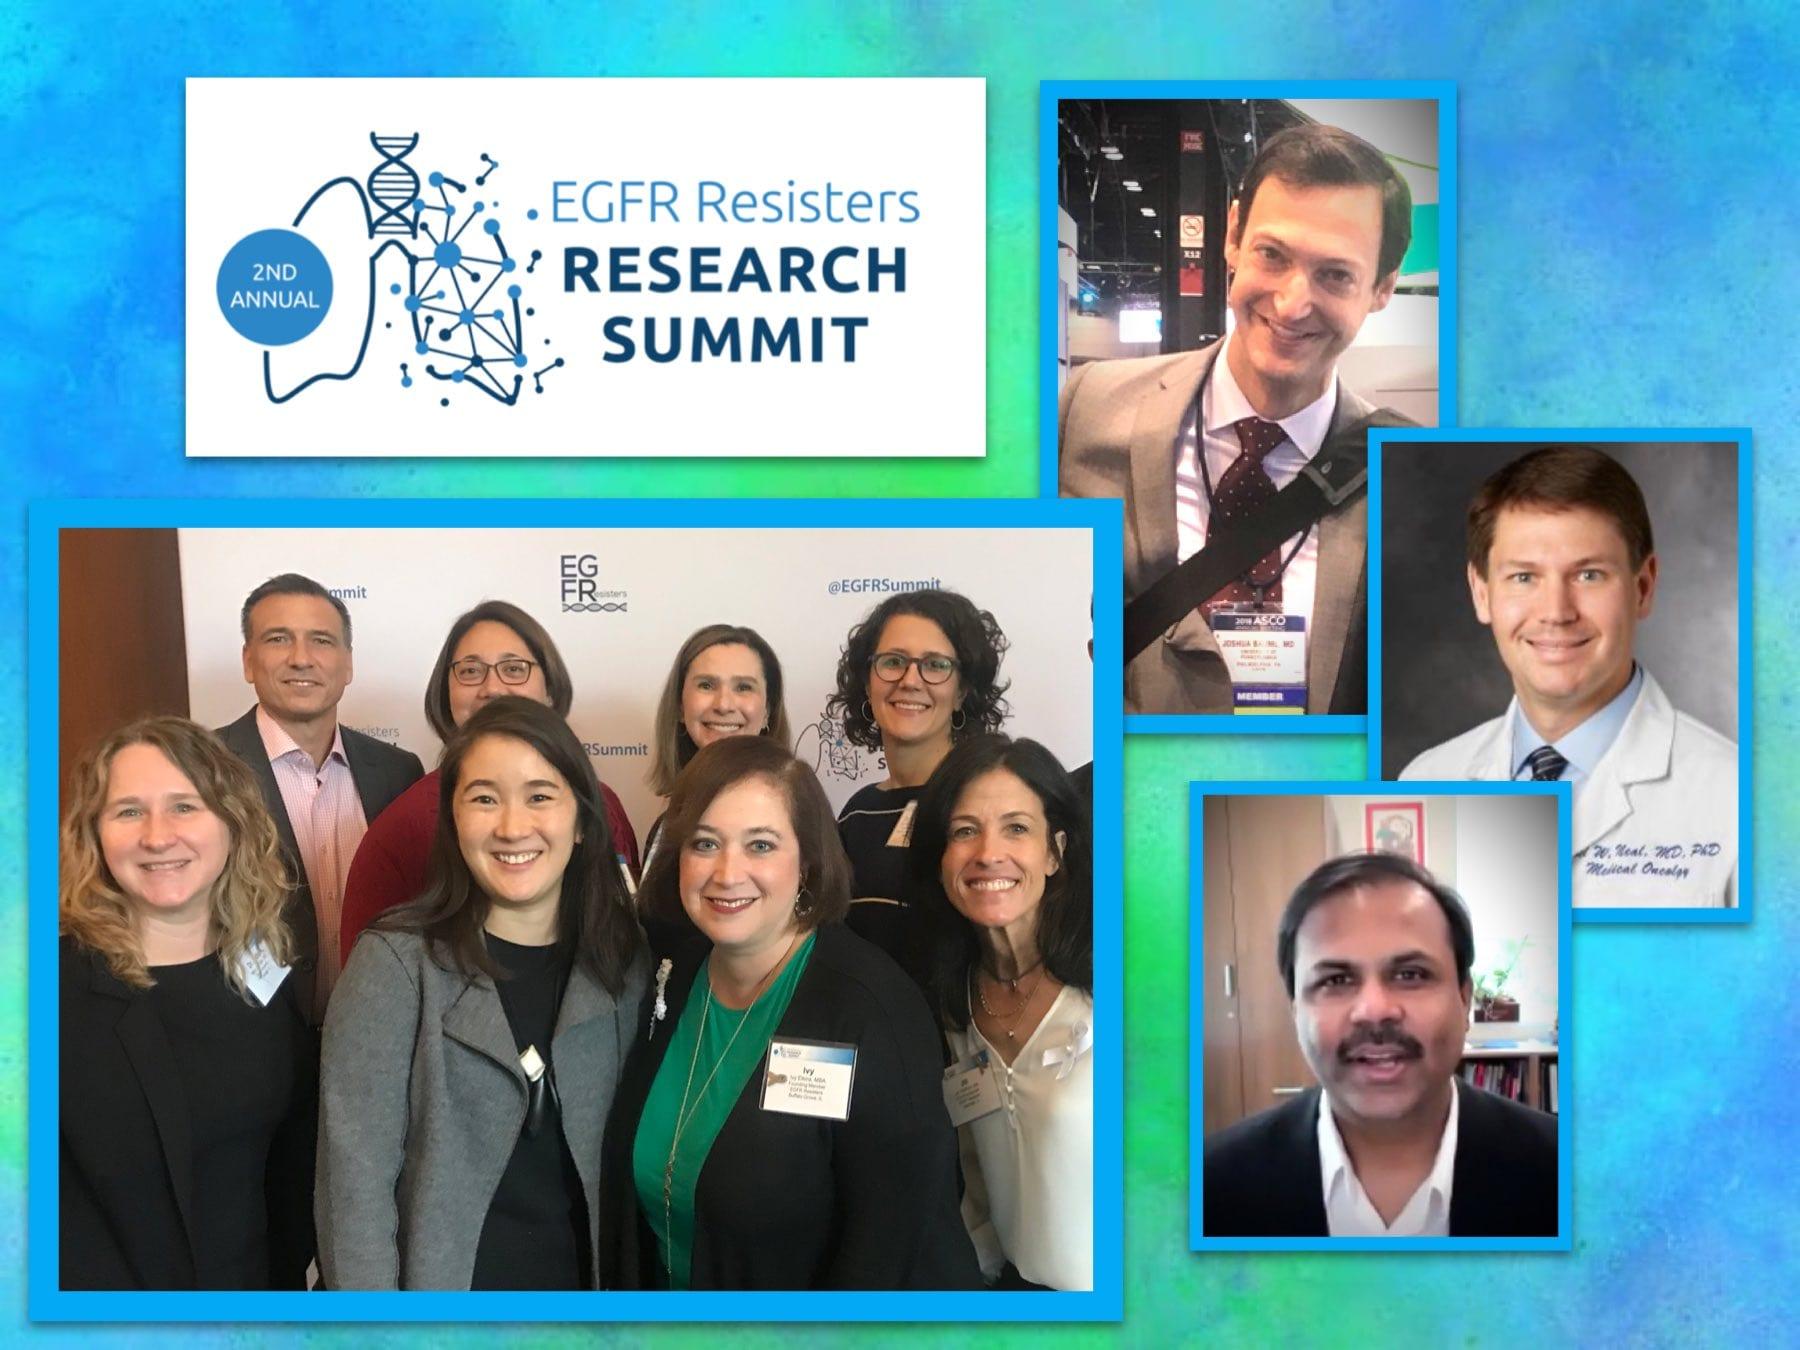 2nd egfr research summit